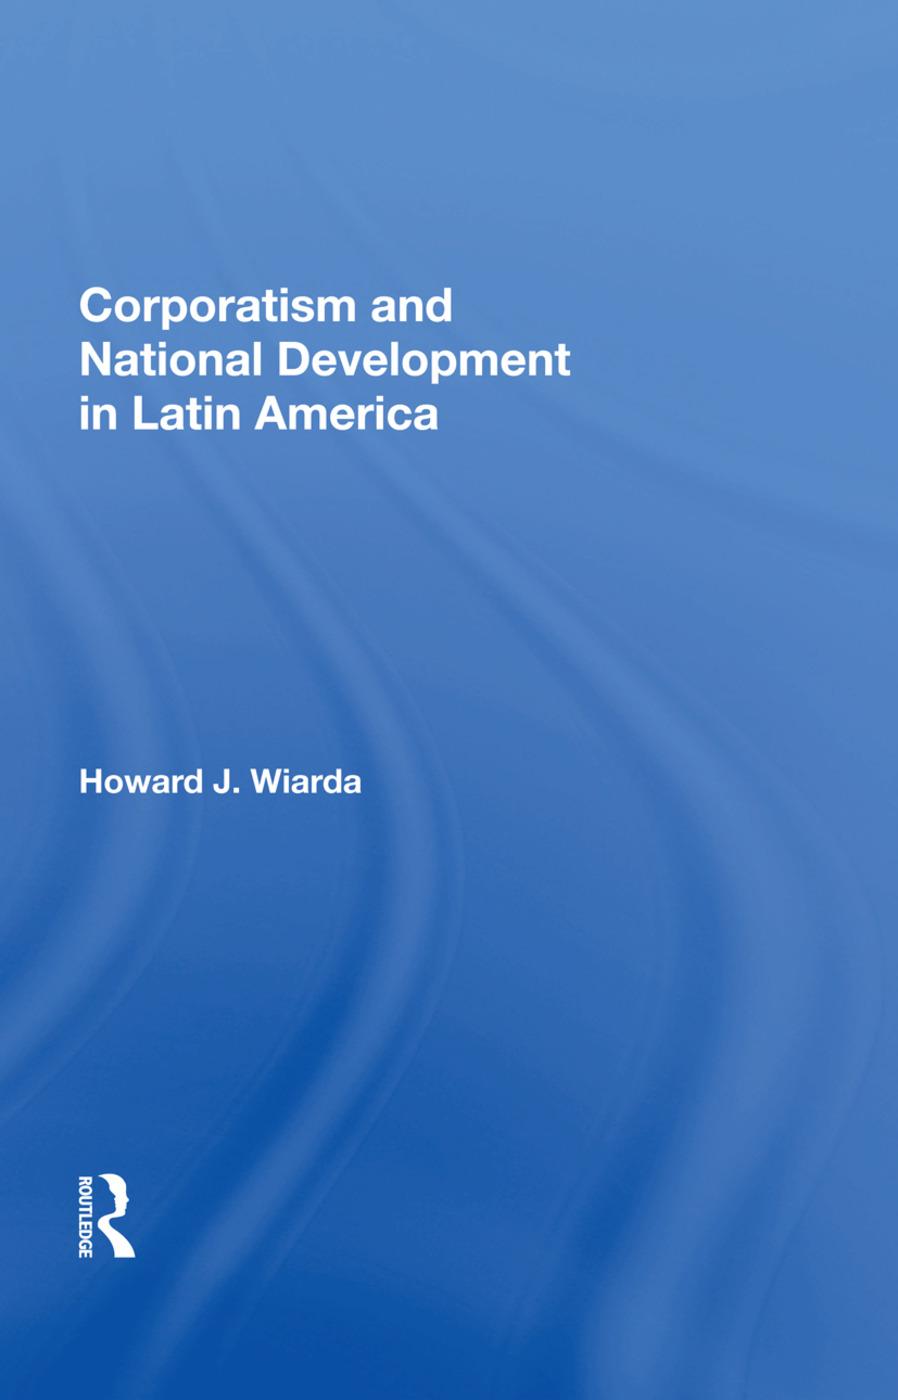 Corporatism and National Development in Latin America